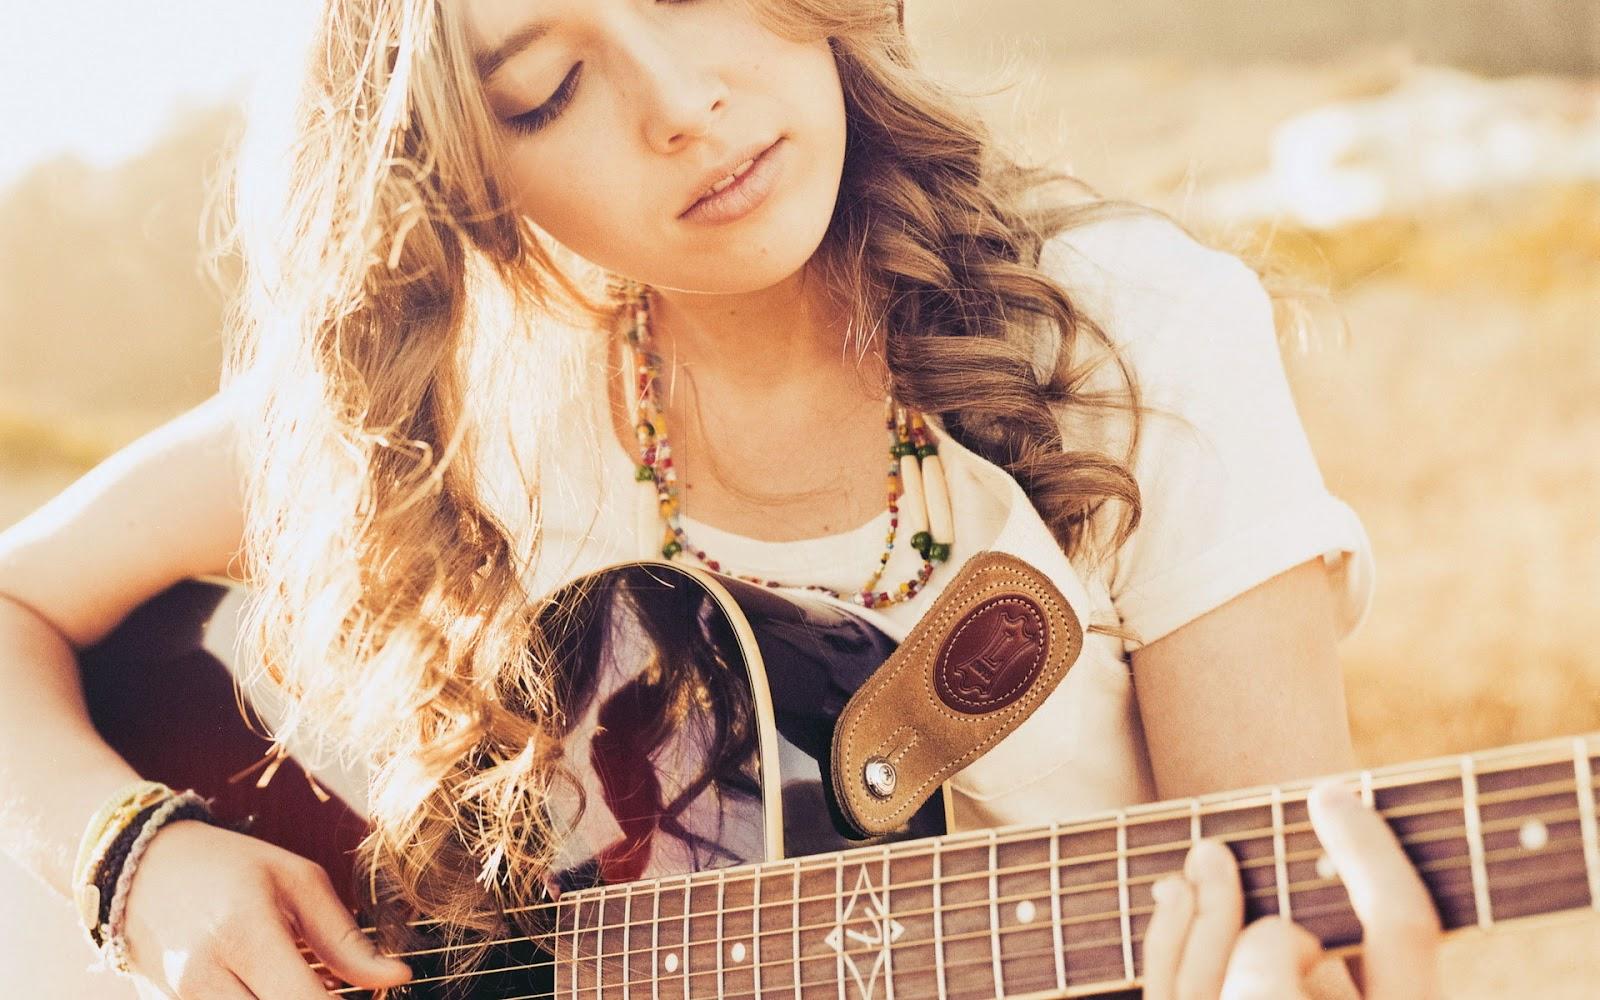 http://1.bp.blogspot.com/-sXIfKMj_xw4/UHHSCY_5NkI/AAAAAAAAFaU/8cPi8pIsw0o/s1600/girl_with_guitar_2_hd_widescreen_wallpapers_1920x1200.jpeg